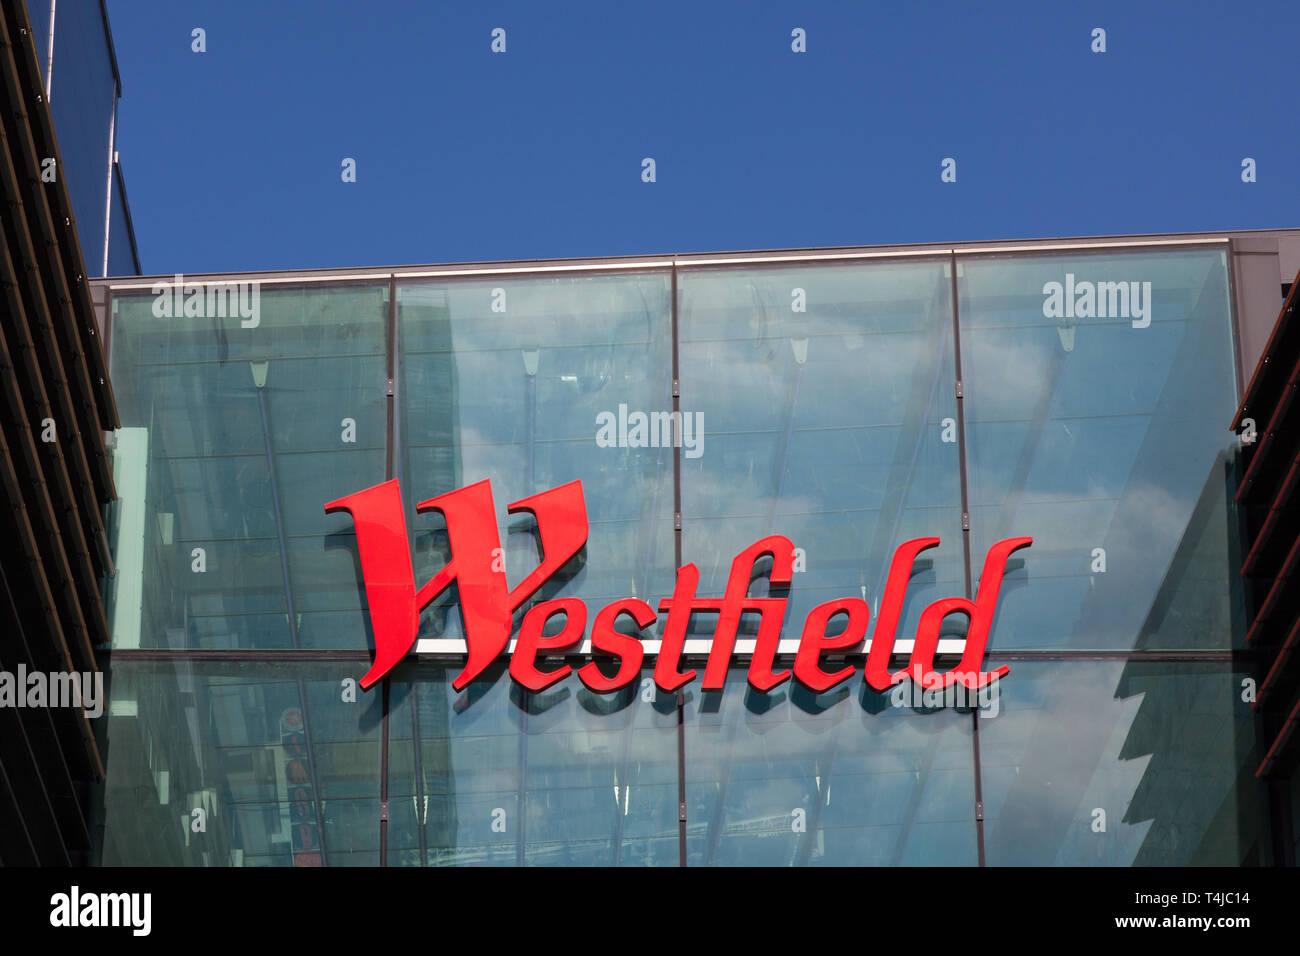 Westfield Shopping Centre, Stratford, London, England, United Kingdom. - Stock Image